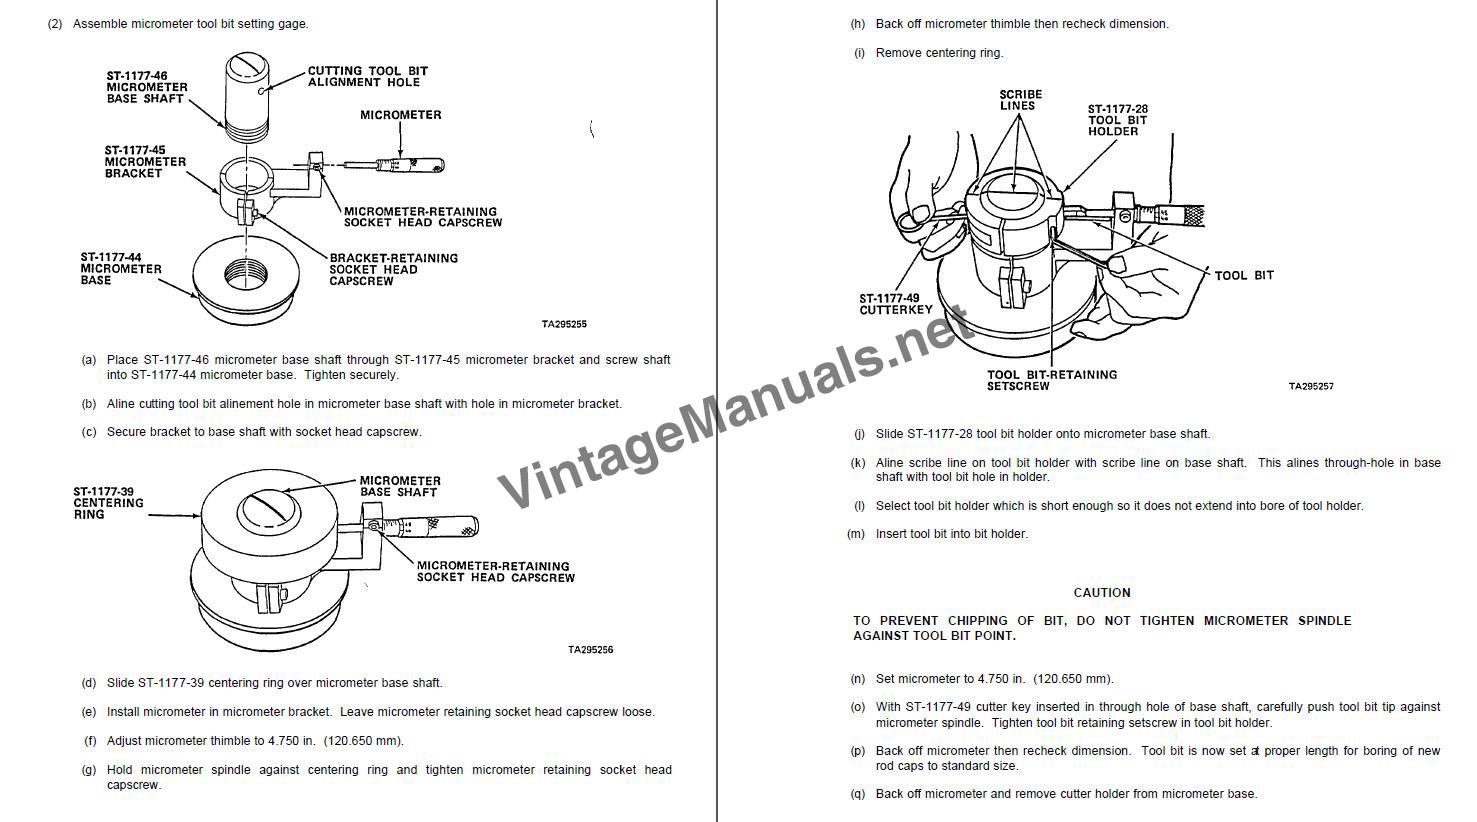 HEADQUARTERS M915A1 Technical Manual